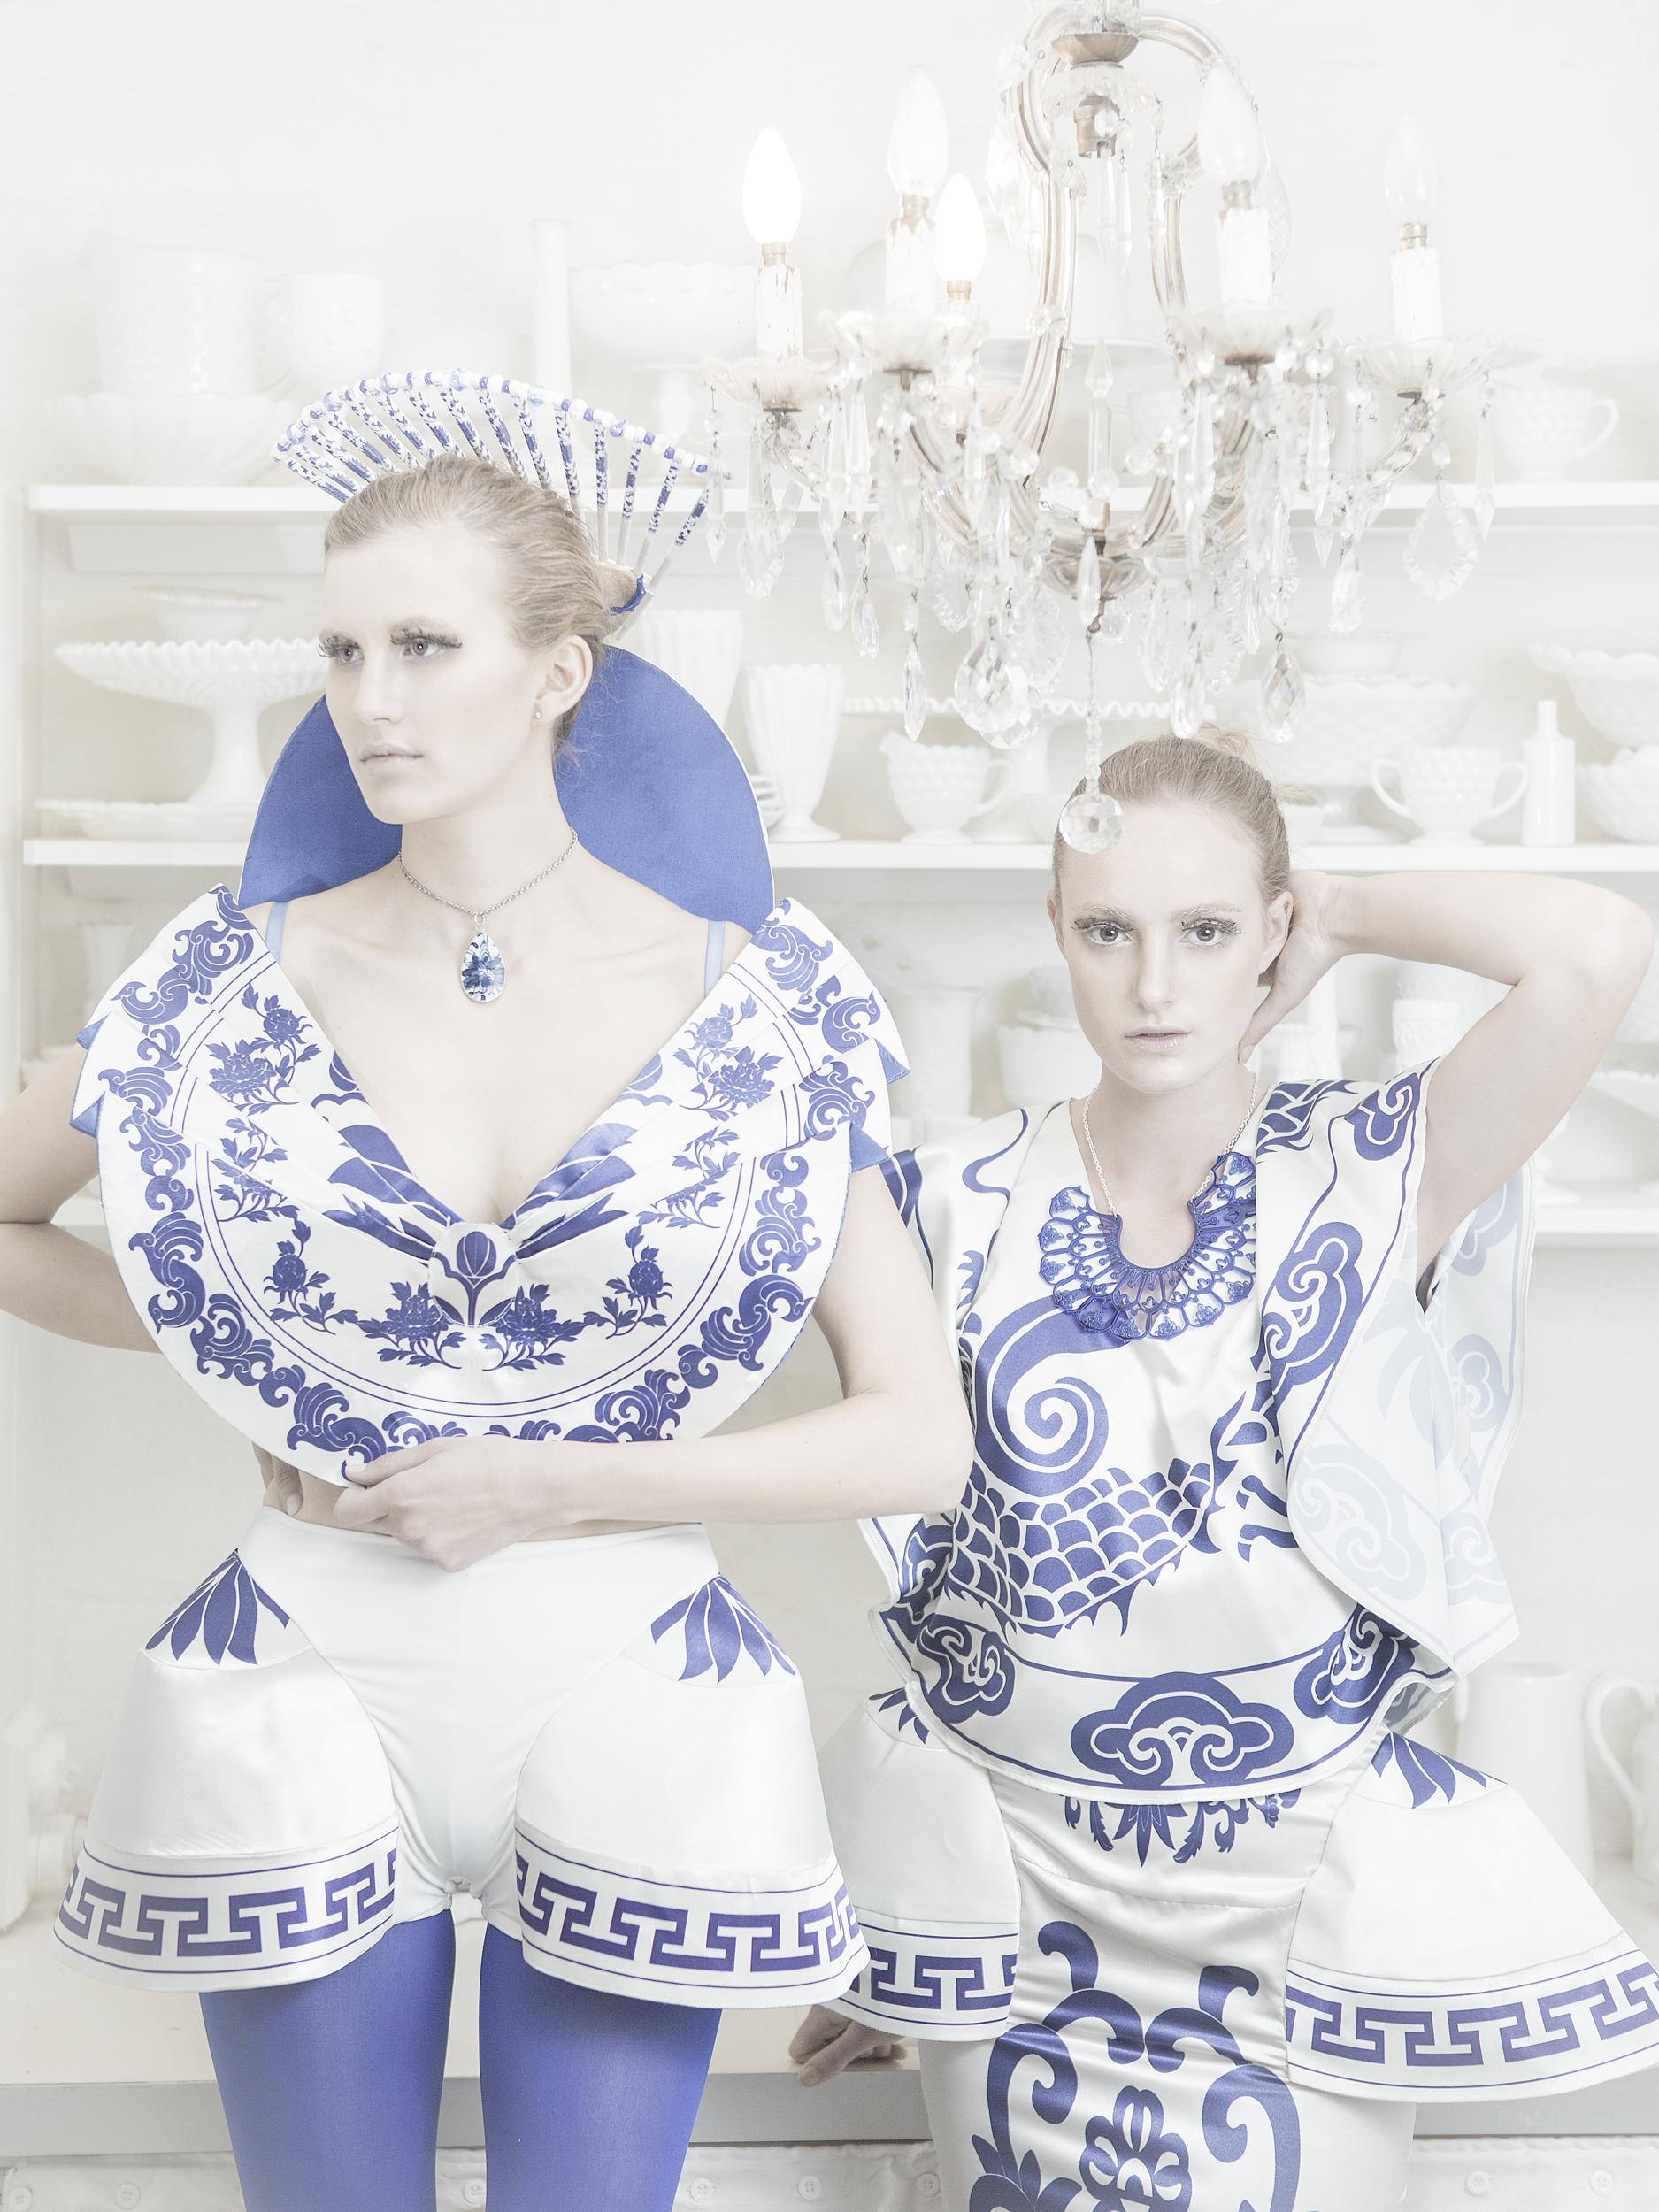 Vikk_Shayen_portfolio_cindyZ_porcelain_wear_9399-Edit.jpg